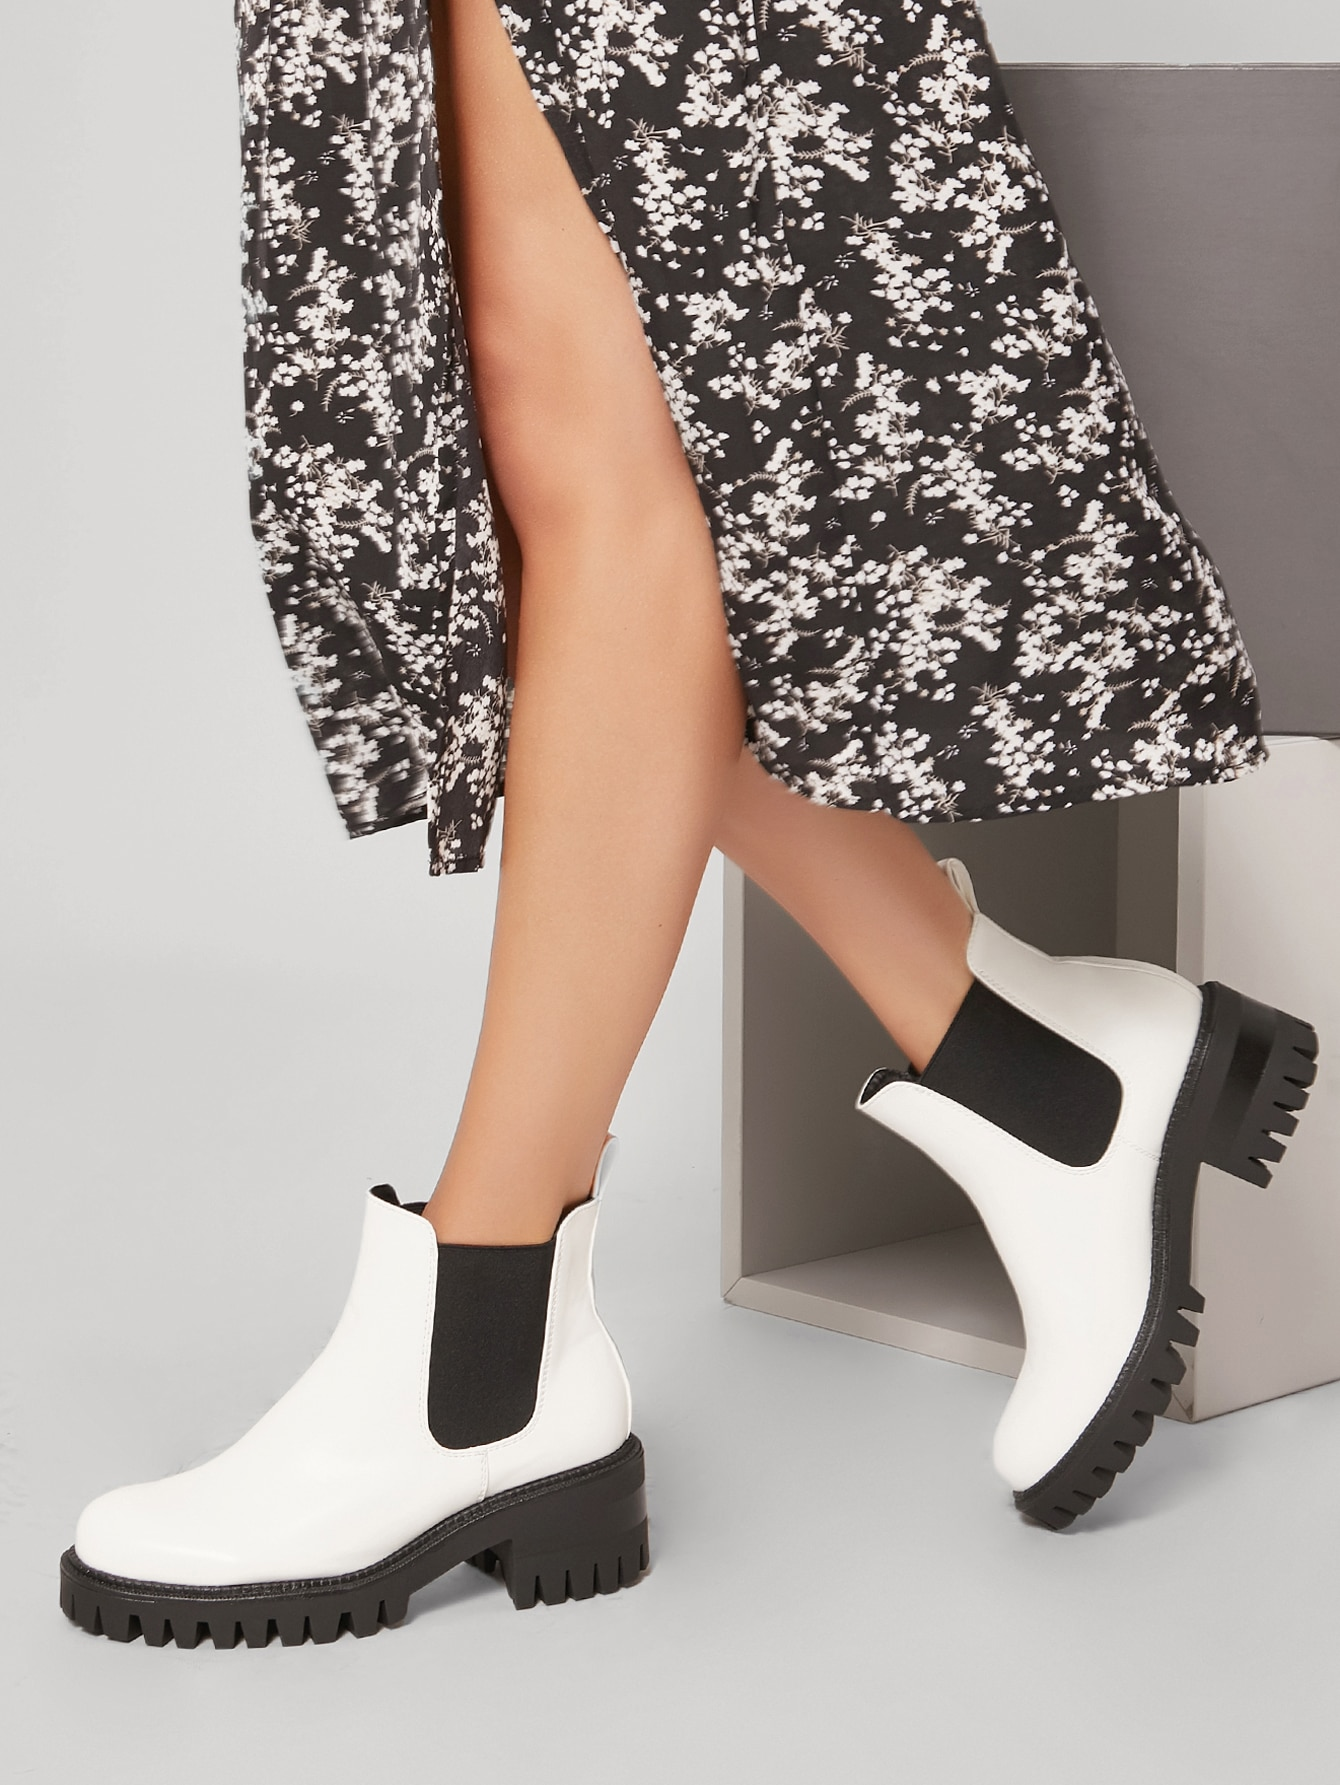 Vegan Leather Lug Sole Block Heel Ankle Boots